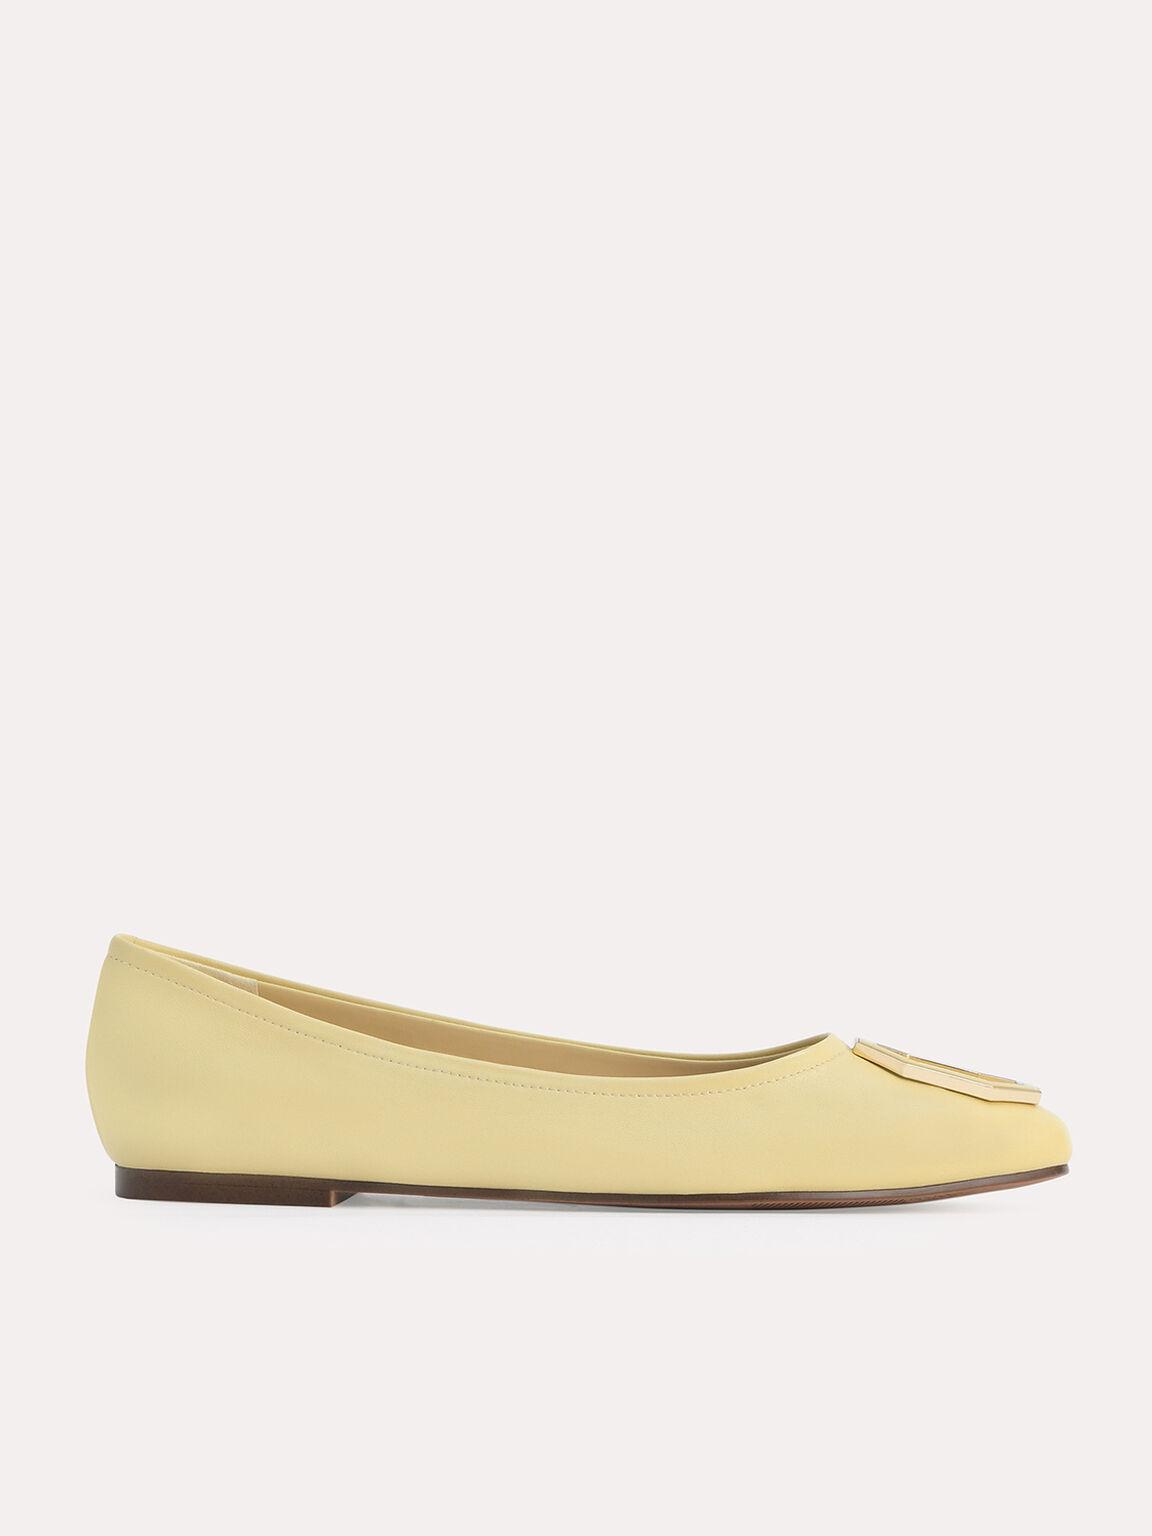 Octagon Buckle Ballerina Leather Flats, Sand, hi-res